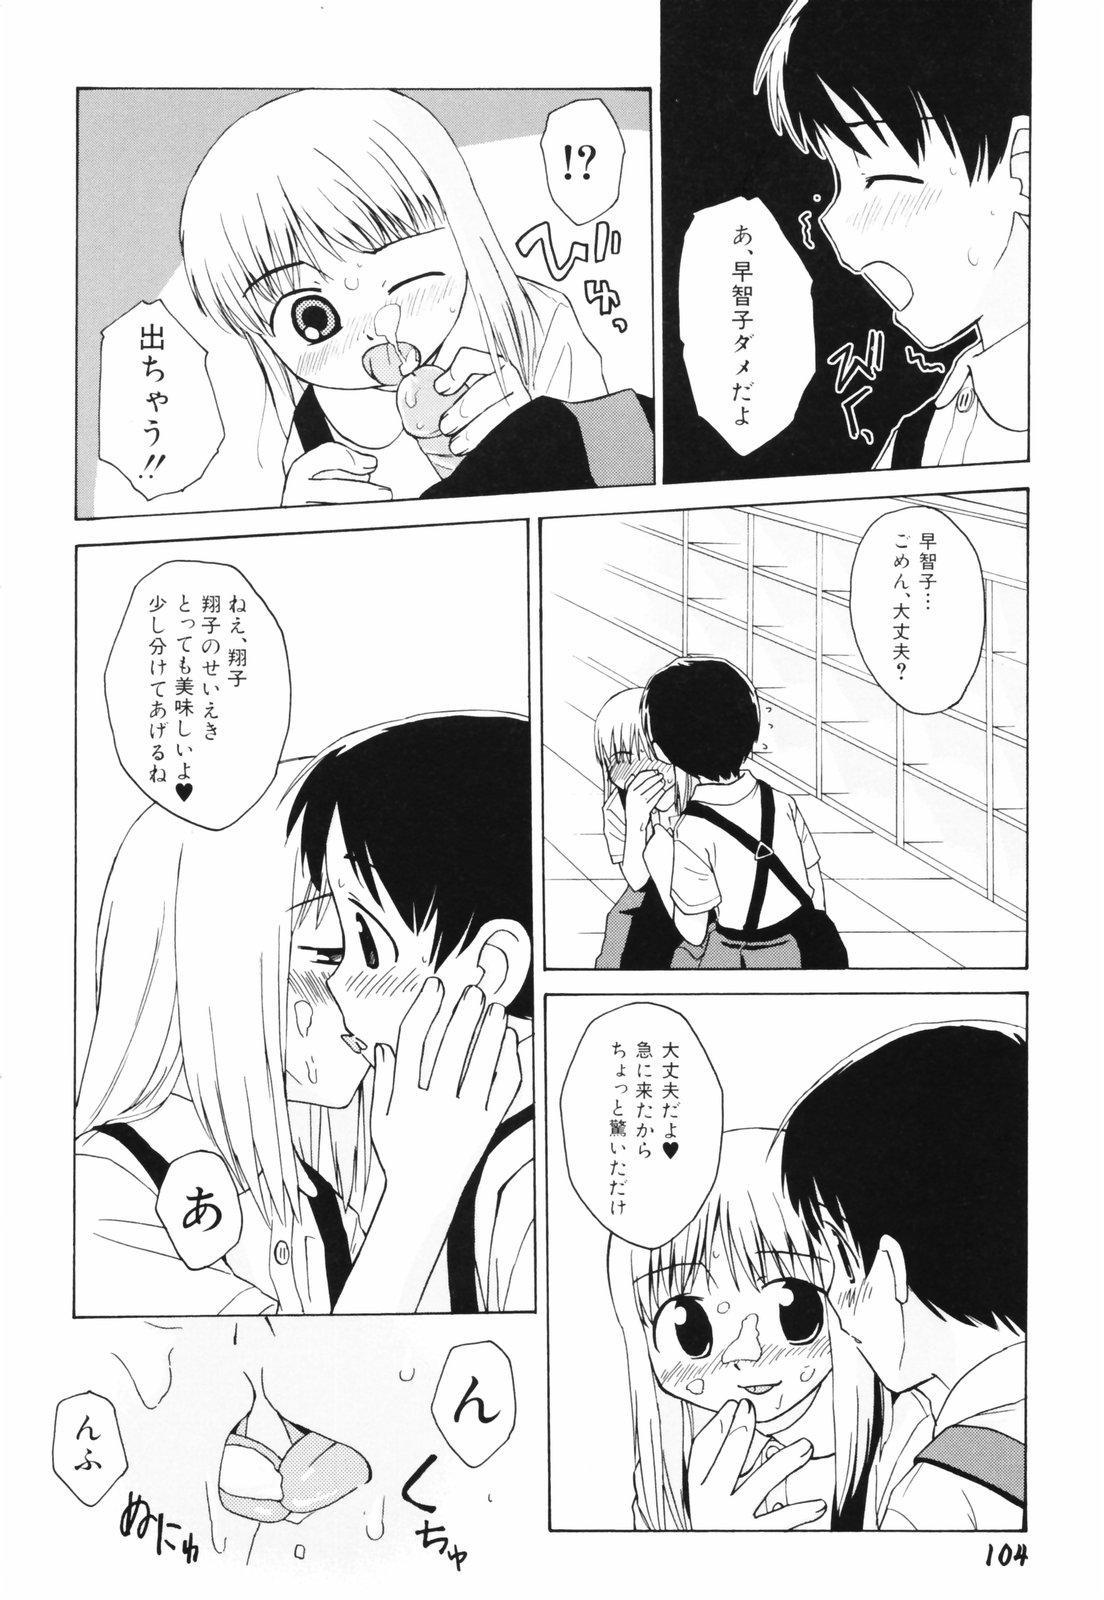 Hanjuku Shoujo 106